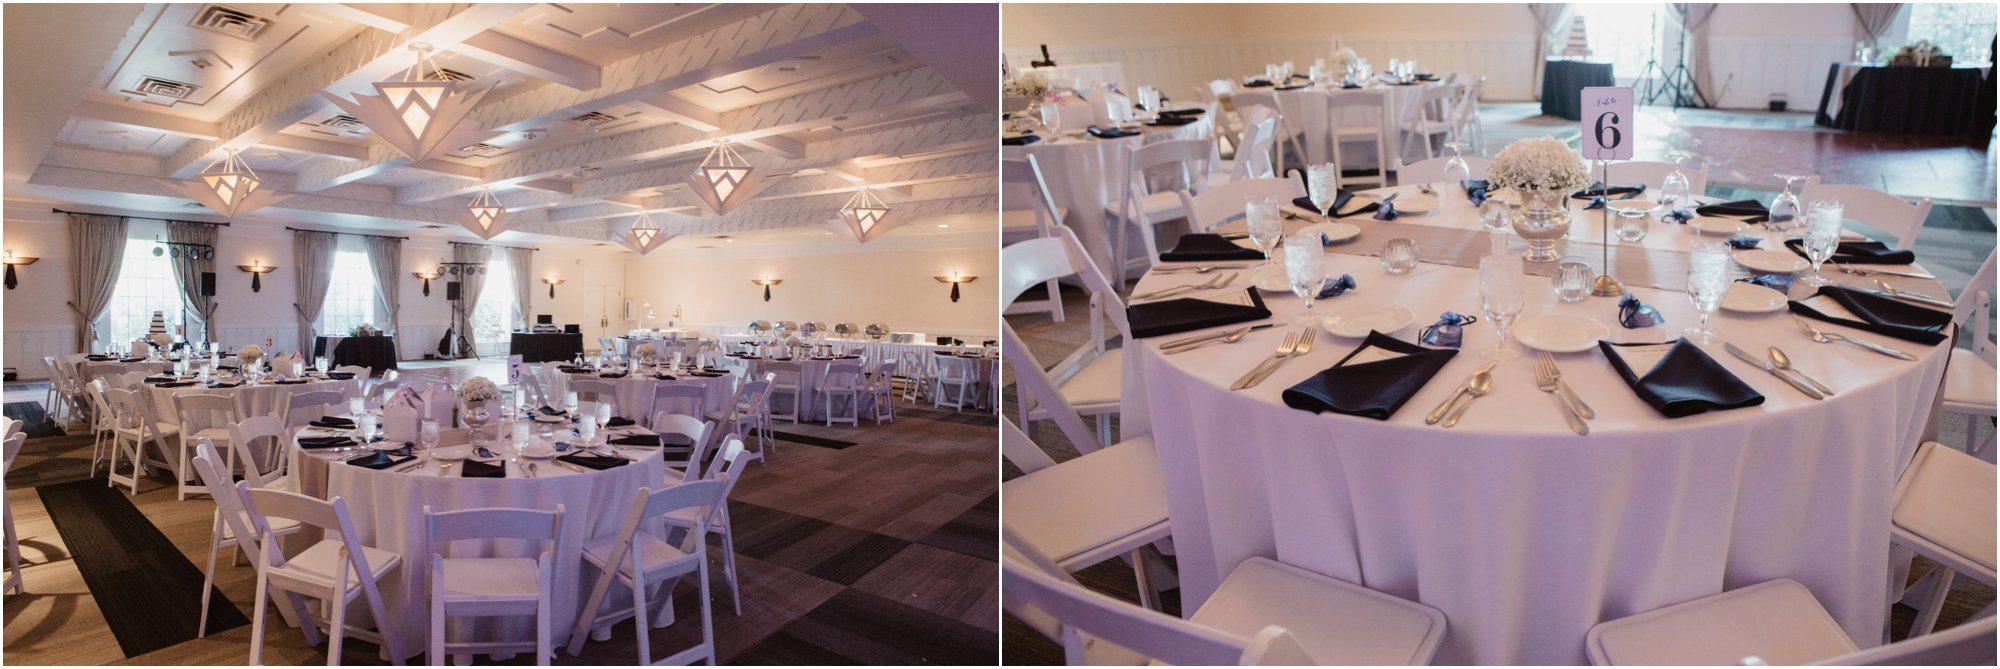 0039albuquerque-wedding-photographer-blue-rose-photography-studio